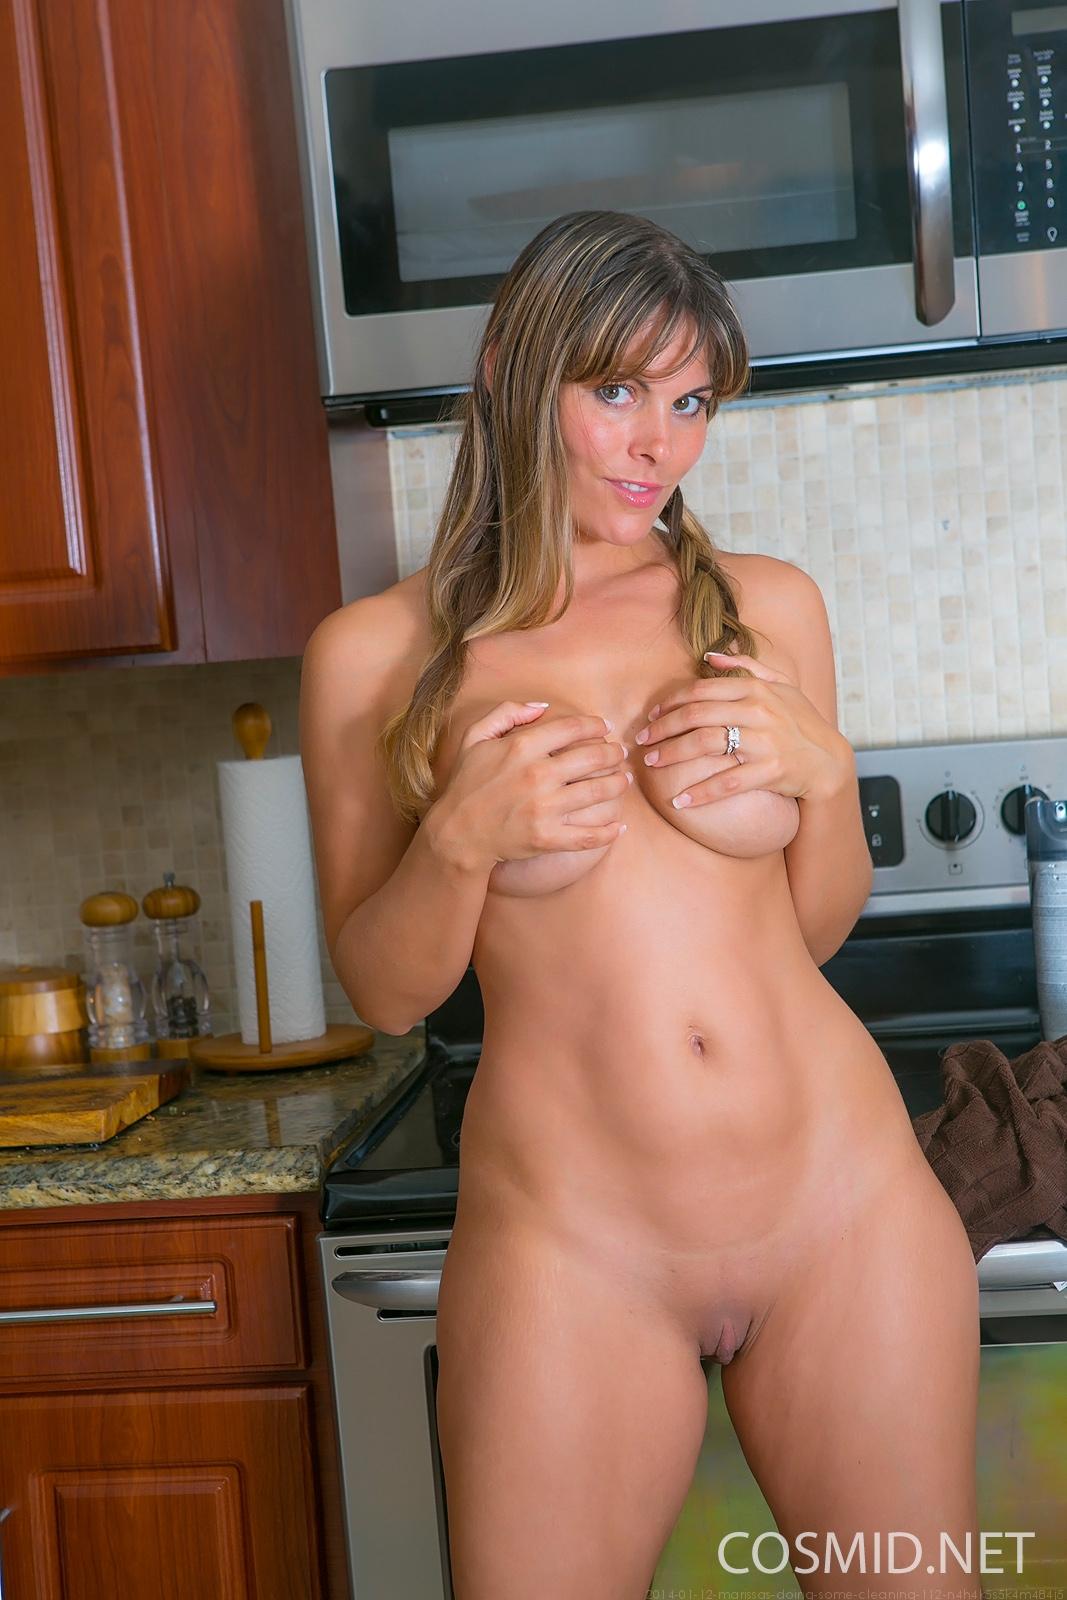 cosmid marissa nude